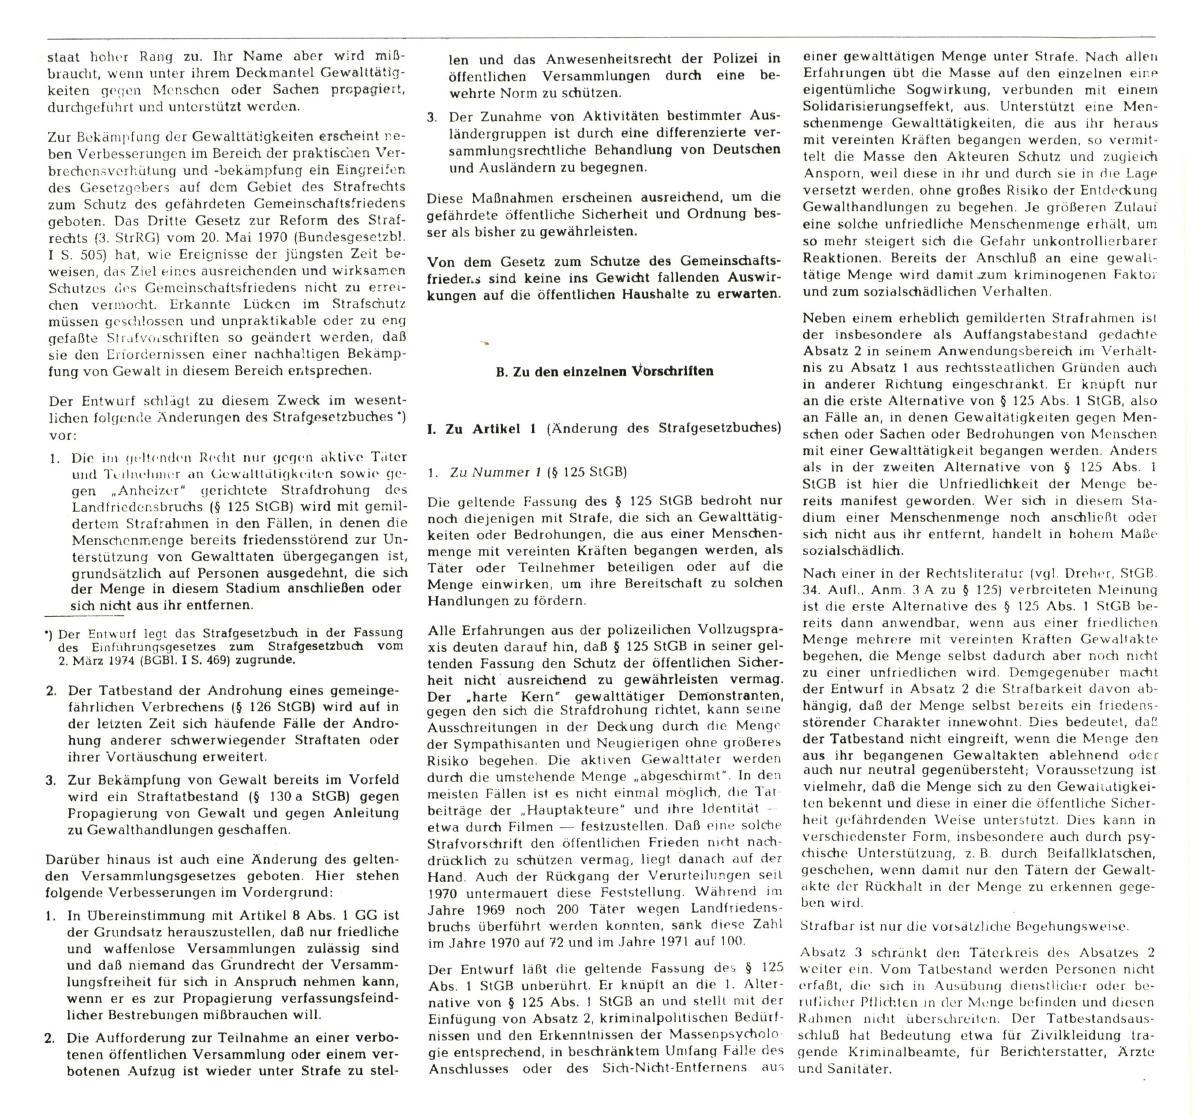 REP_VLB_1976_Die_Zensurgesetze_53